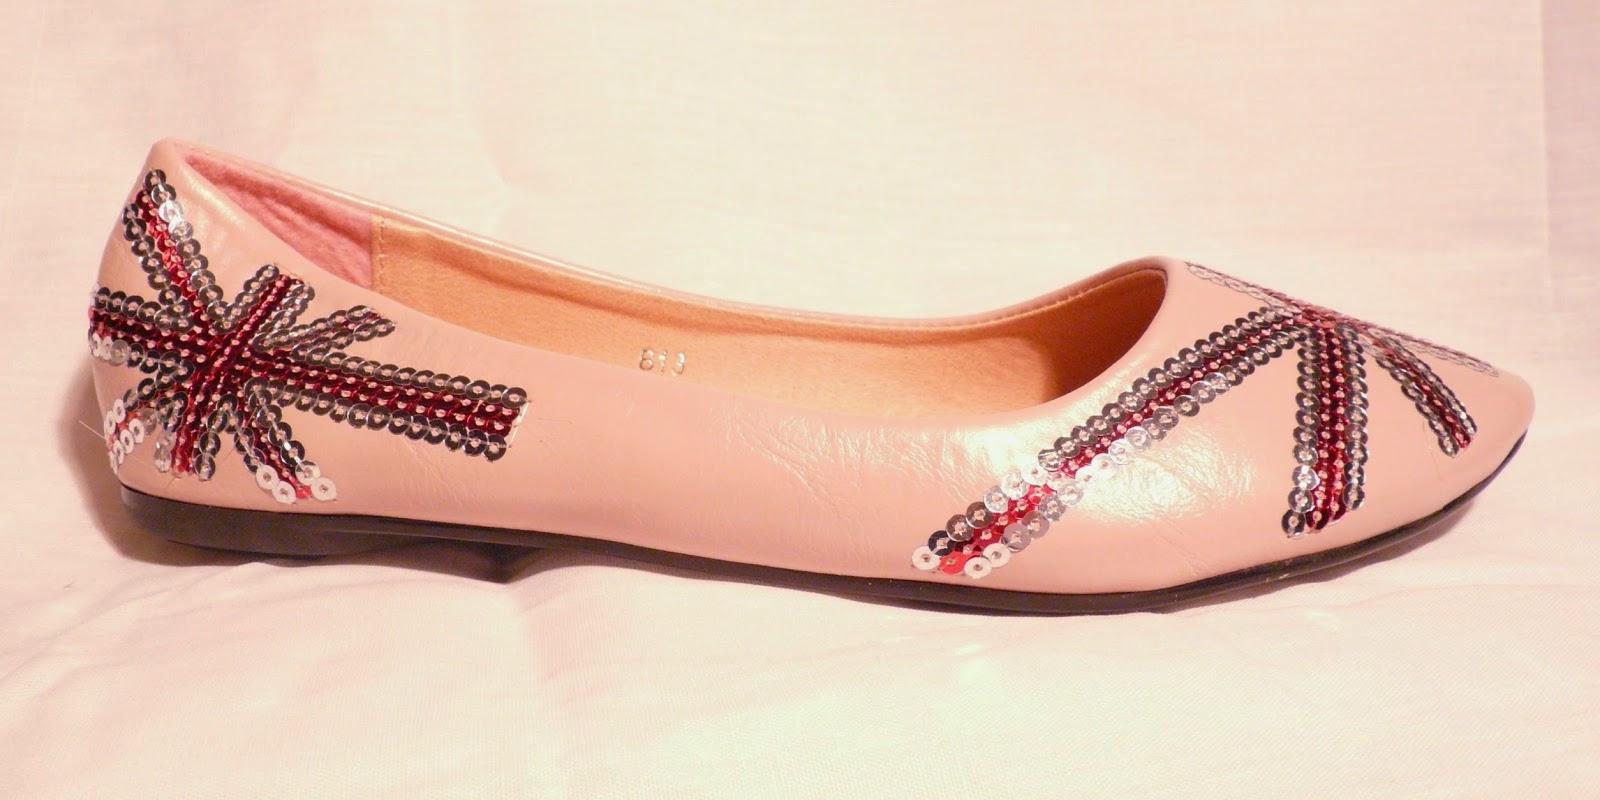 http://www.ebay.fr/itm/ballerines-rose-pale-drapeau-anglais-ballerine-femme-rose-DERNIERES-37-38-39-/300848574267?ssPageName=STRK:MESE:IT